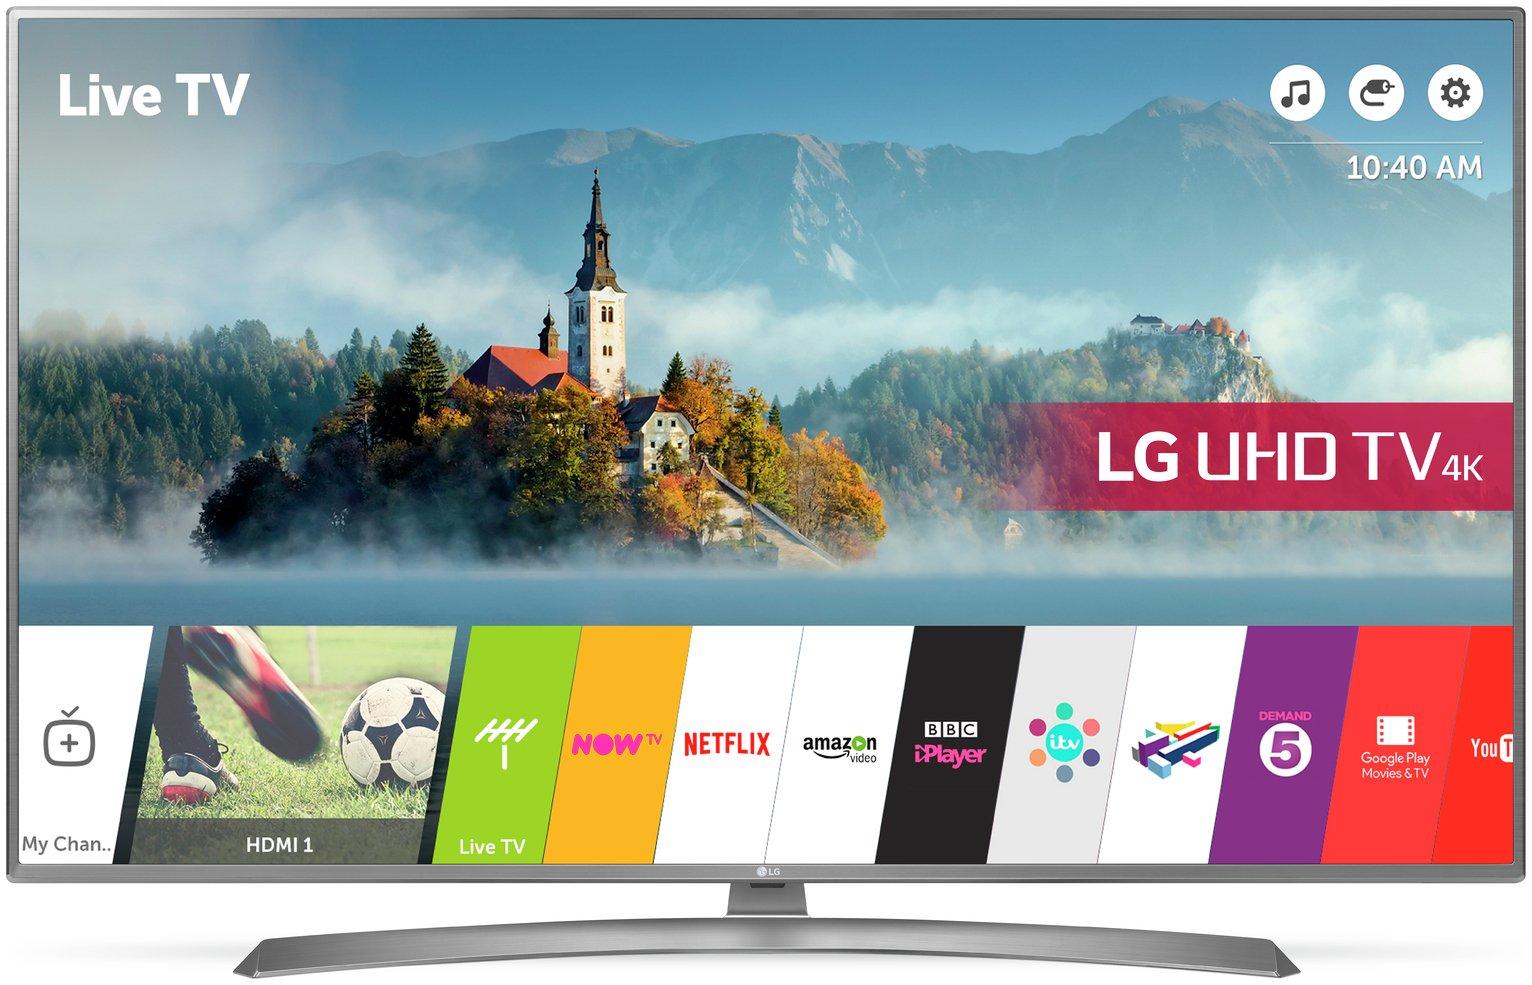 LG 65UJ670V 65 Inch Smart 4K Ultra HD TV with HDR.